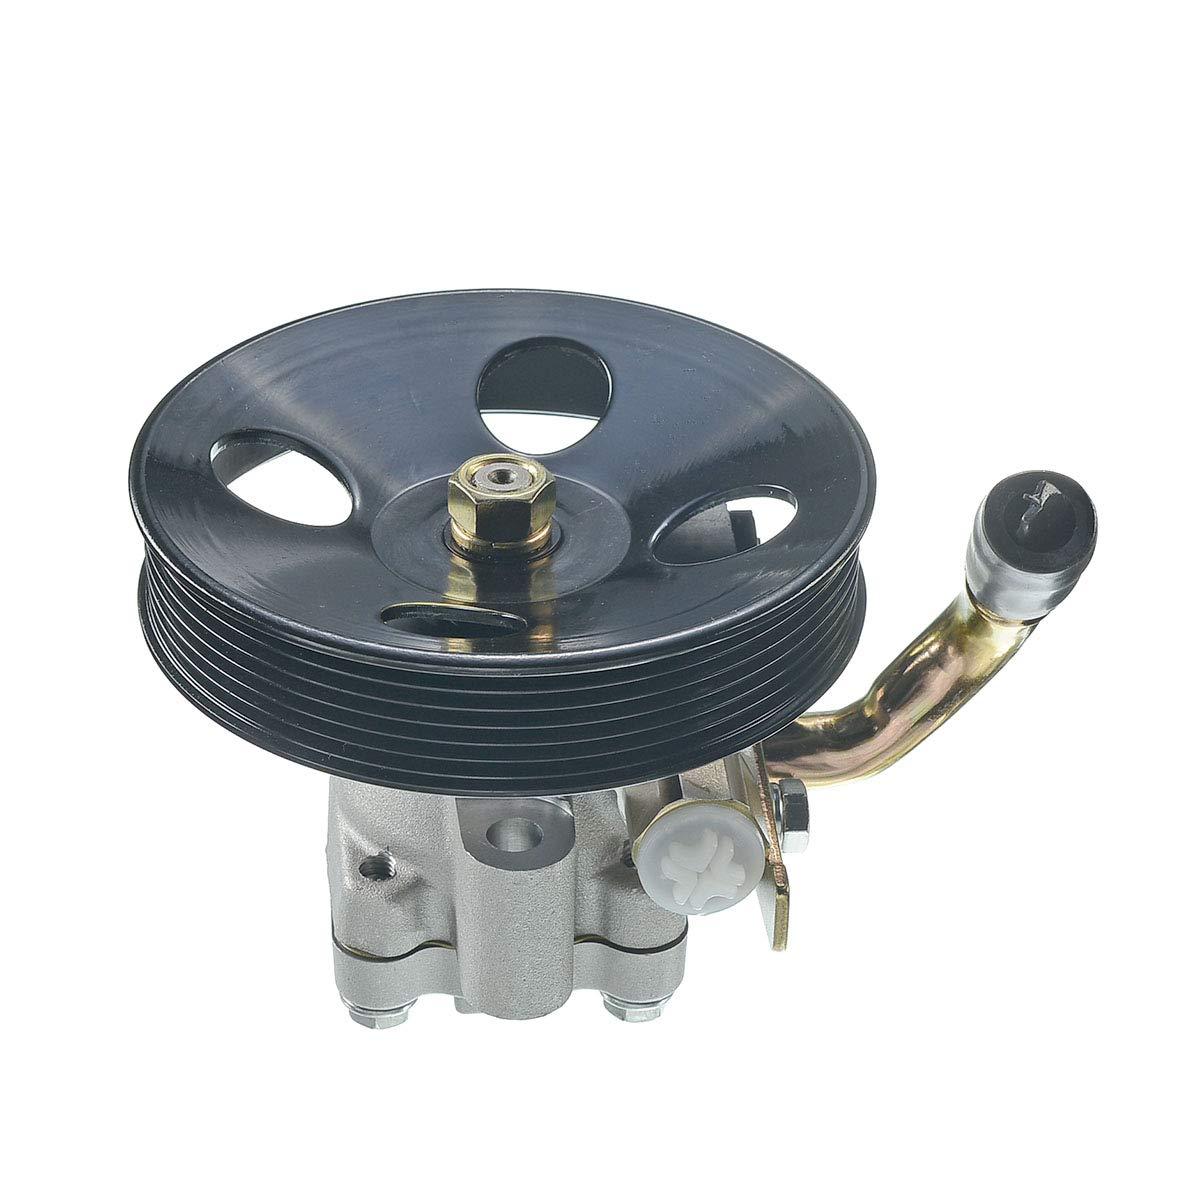 ECCPP 21-5449 Power Steering Pump Power Assist Pump Fit for 2005-2009 Hyundai Tucson 2005-2010 Kia Sportage